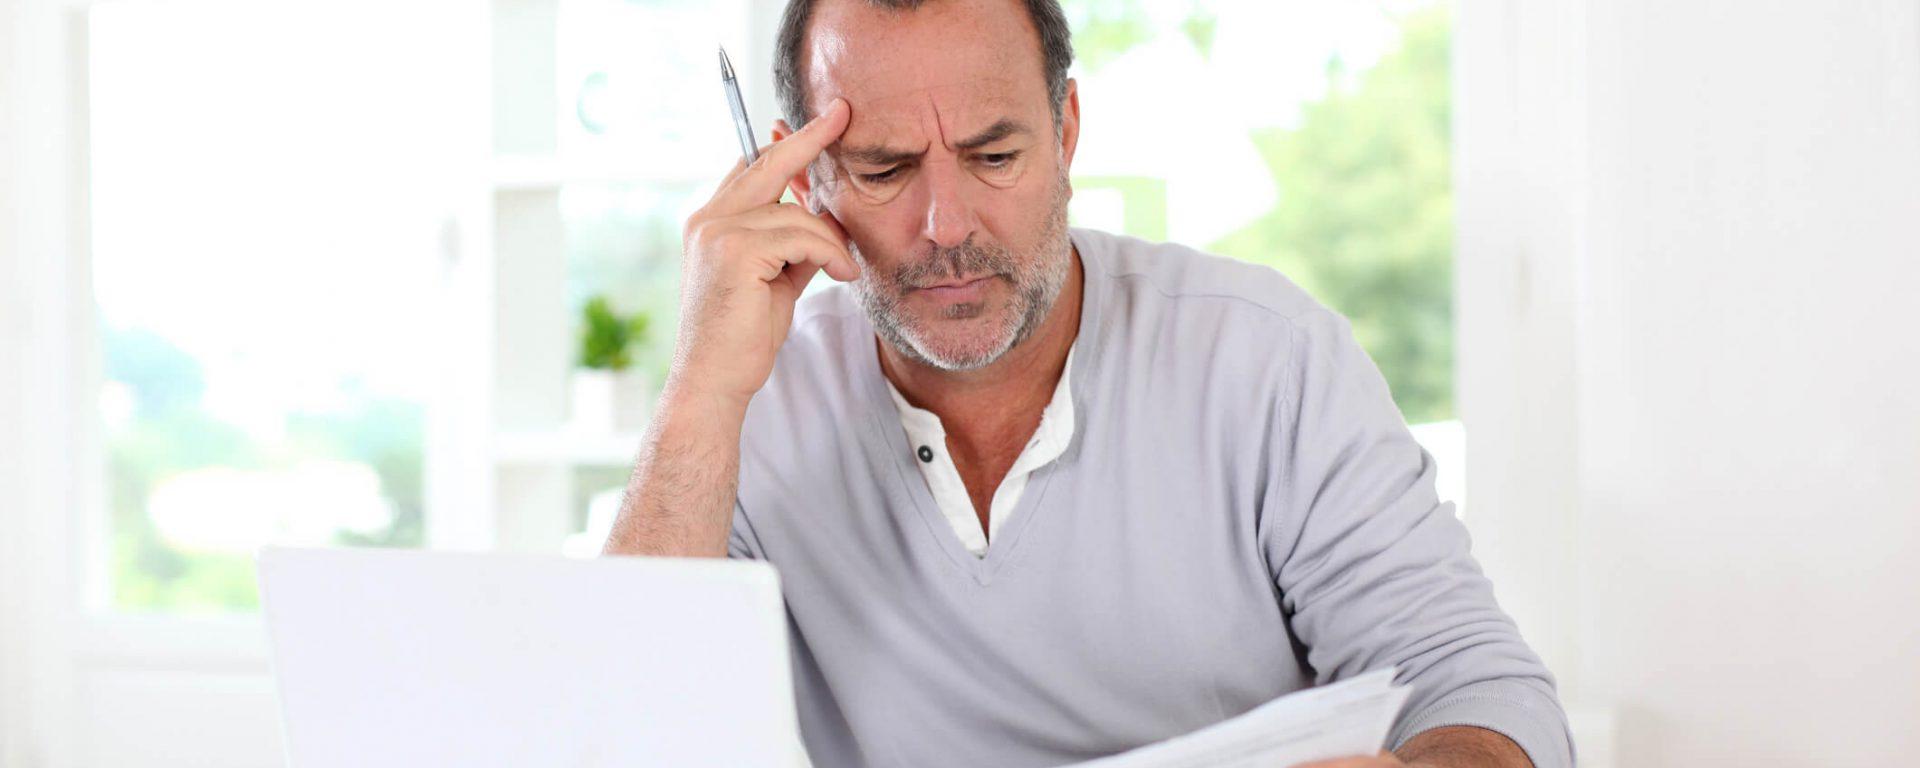 Declarar imóvel financiado: 4 passos essenciais no imposto de renda